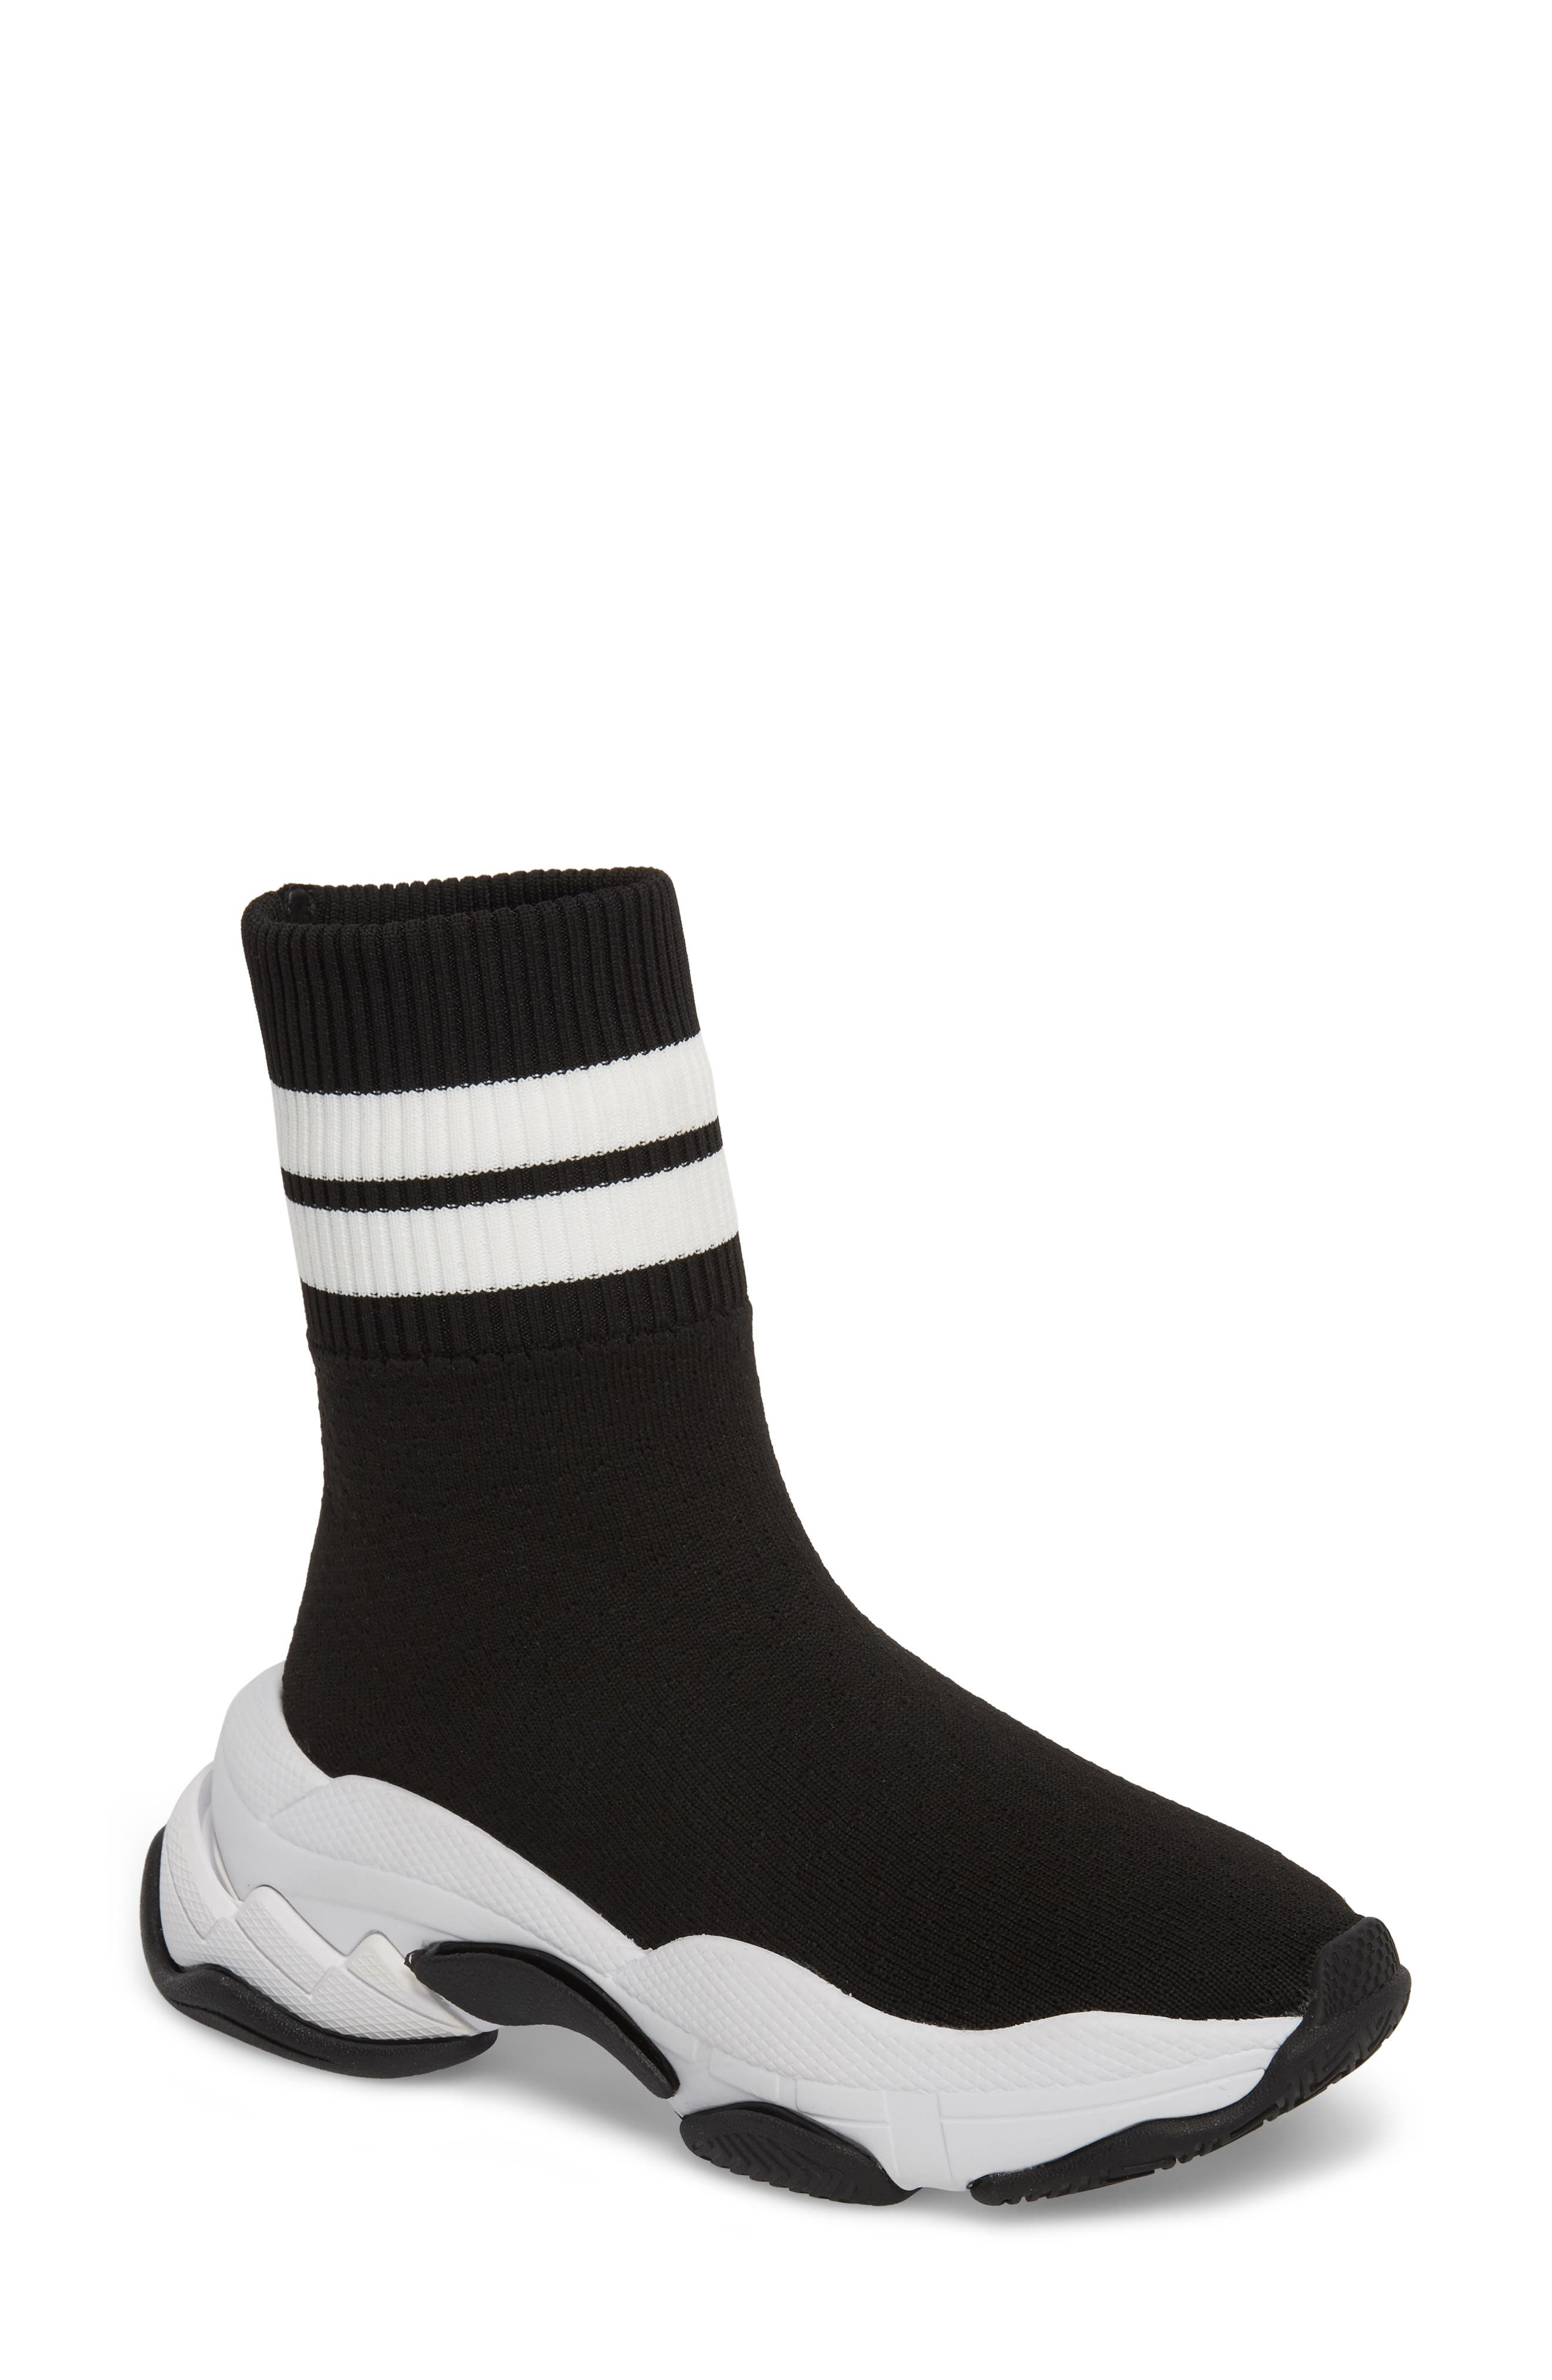 Tenko Ankle High Top Sock Sneaker,                             Main thumbnail 1, color,                             Black/ White Stripe Fabric